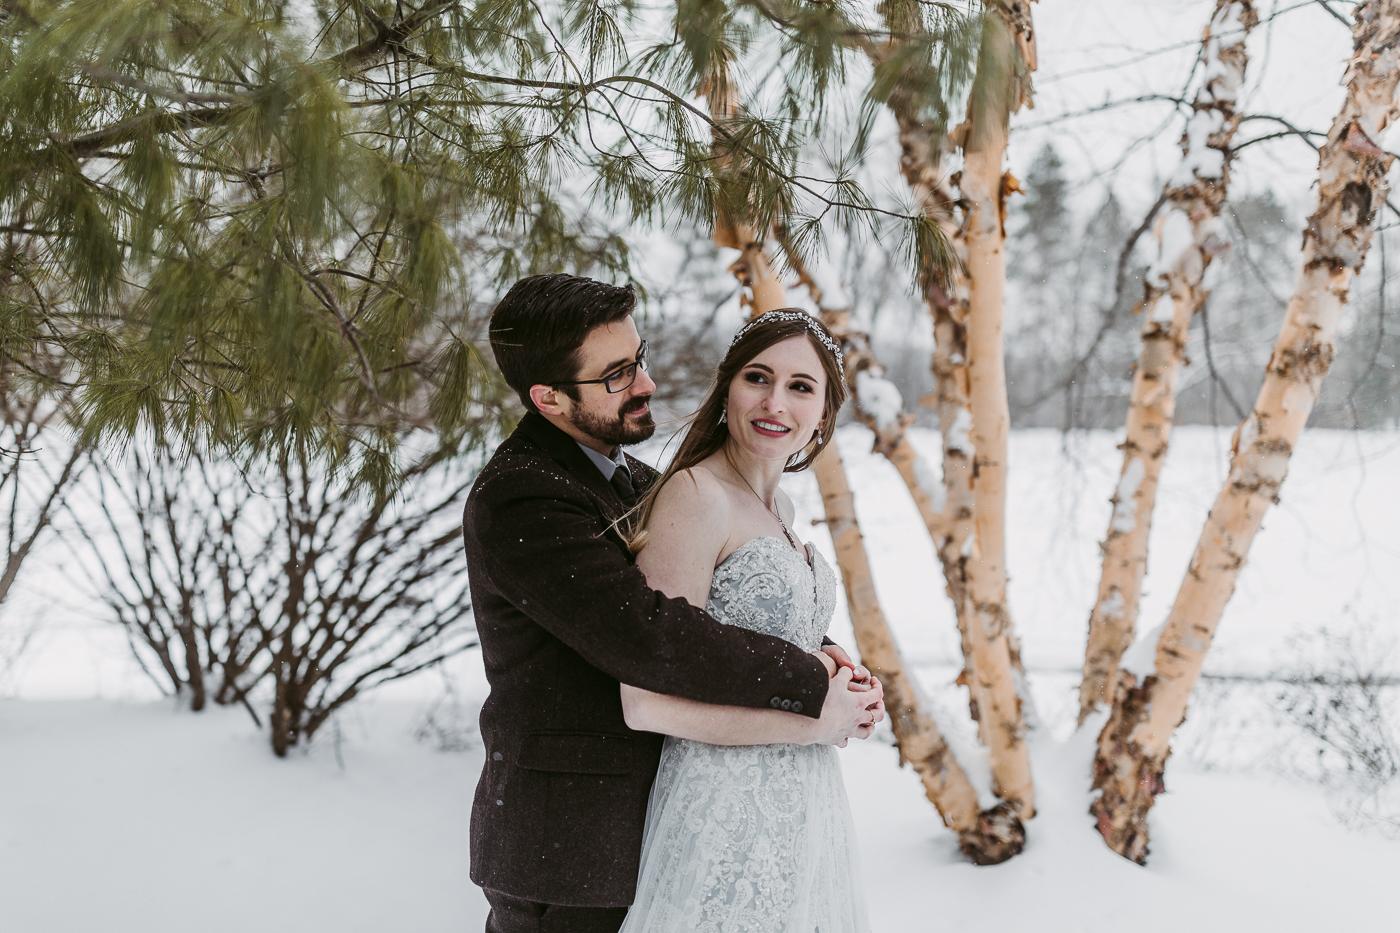 Squires-Castle-Winter-Wedding-11.jpg